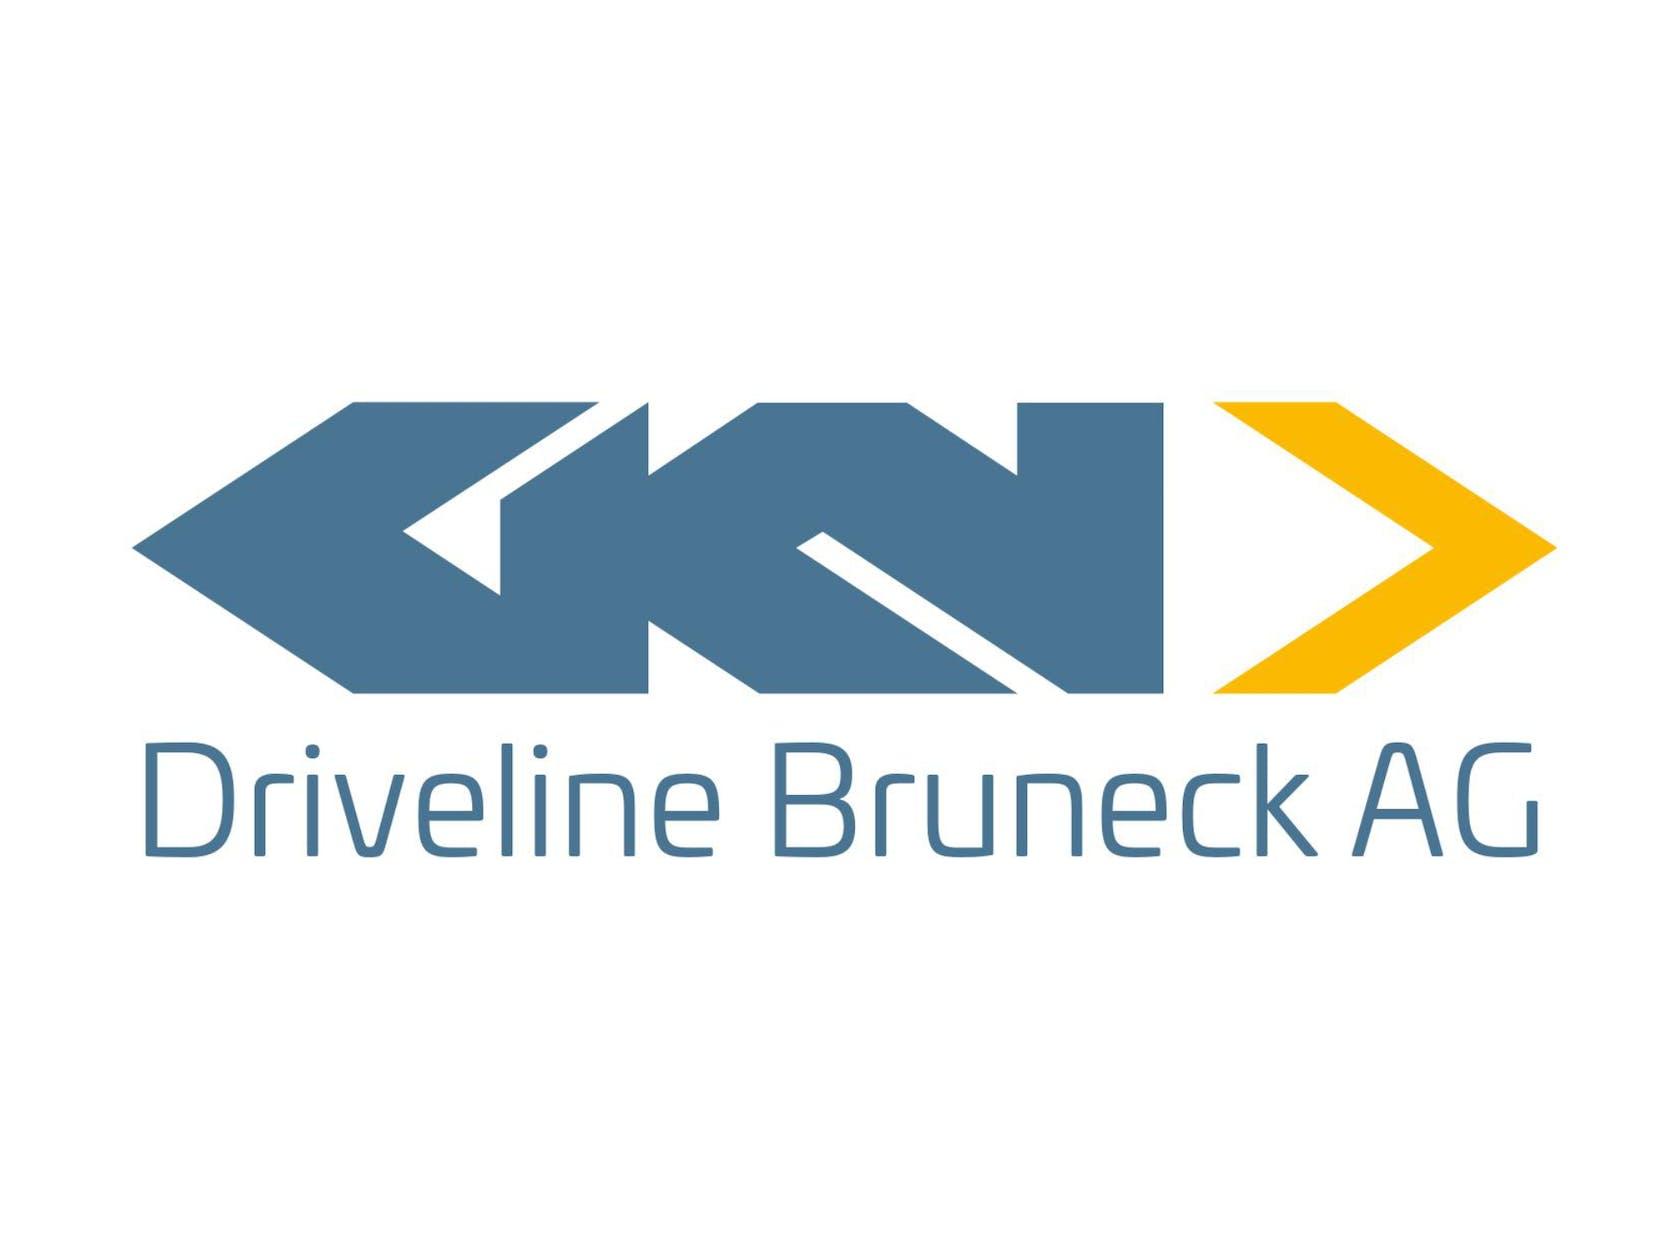 GKN Driveline Brunico SpA